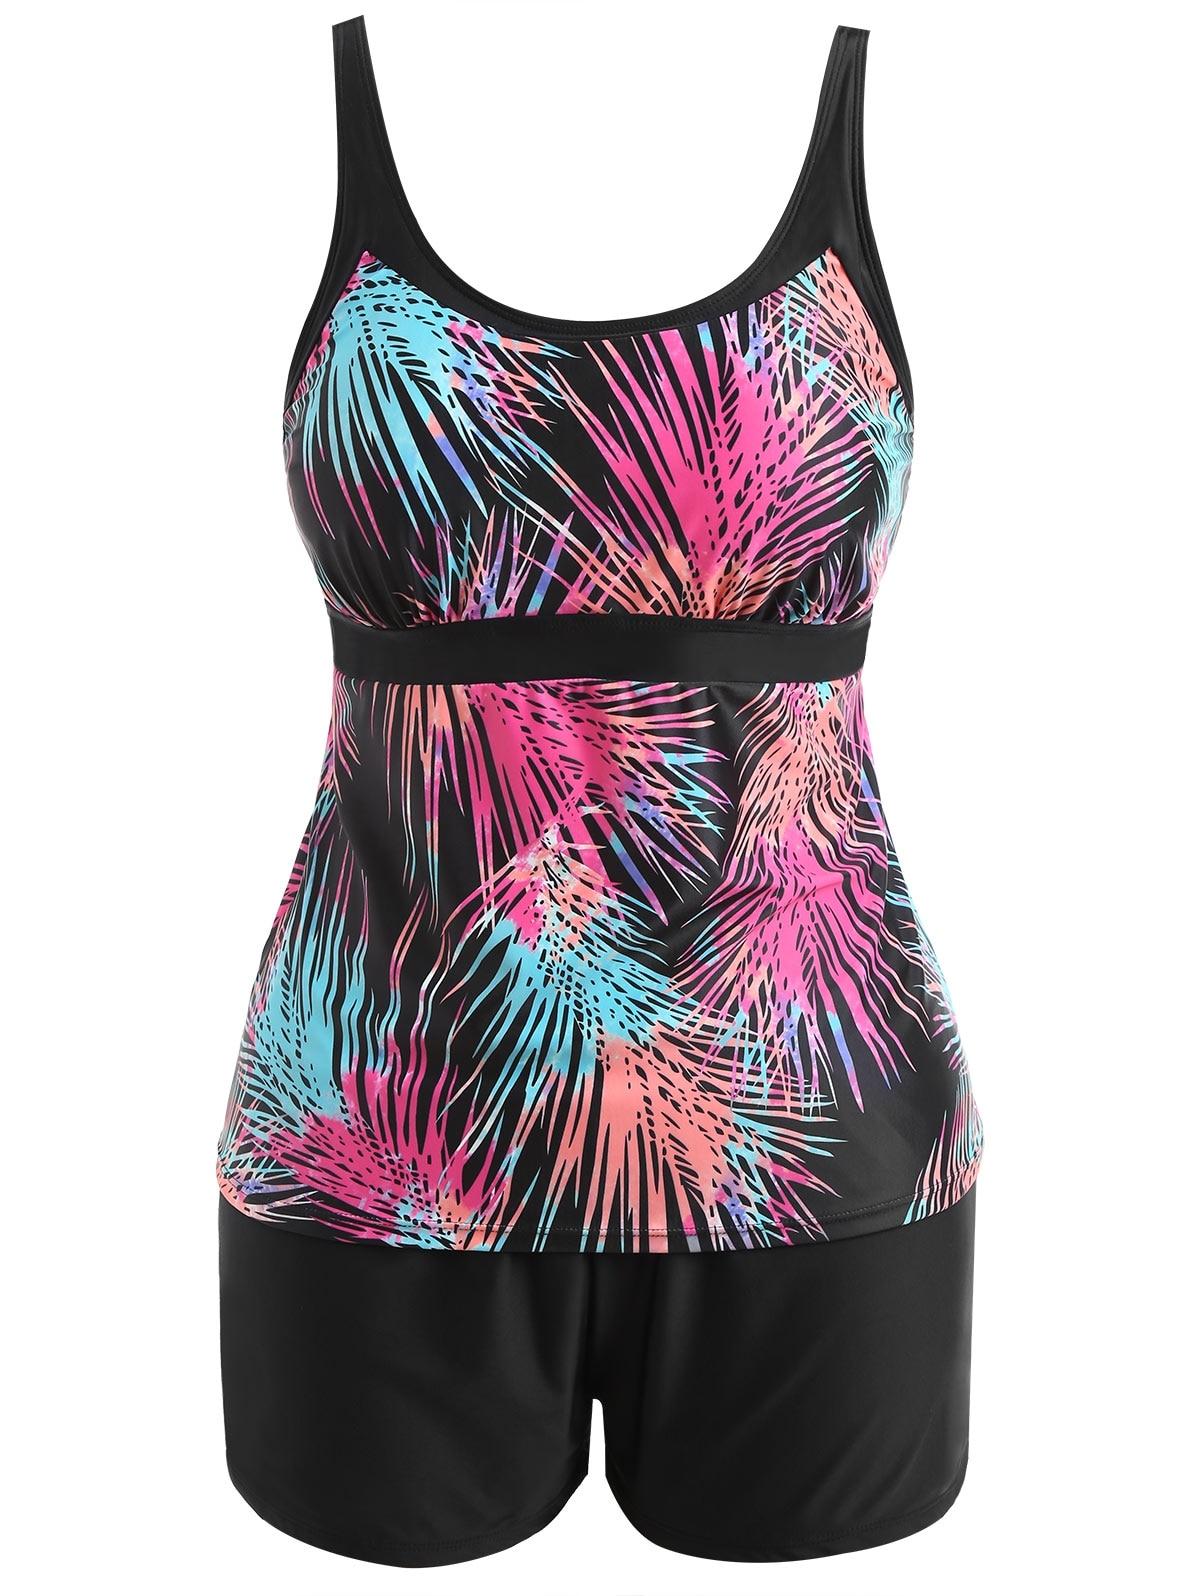 2 Pieces Swimsuit Bikinis Set Tankini with Shorts Women Leaf Ombre Swimwear Plus Big Size Bathing Suit Cover Ups Beachwear